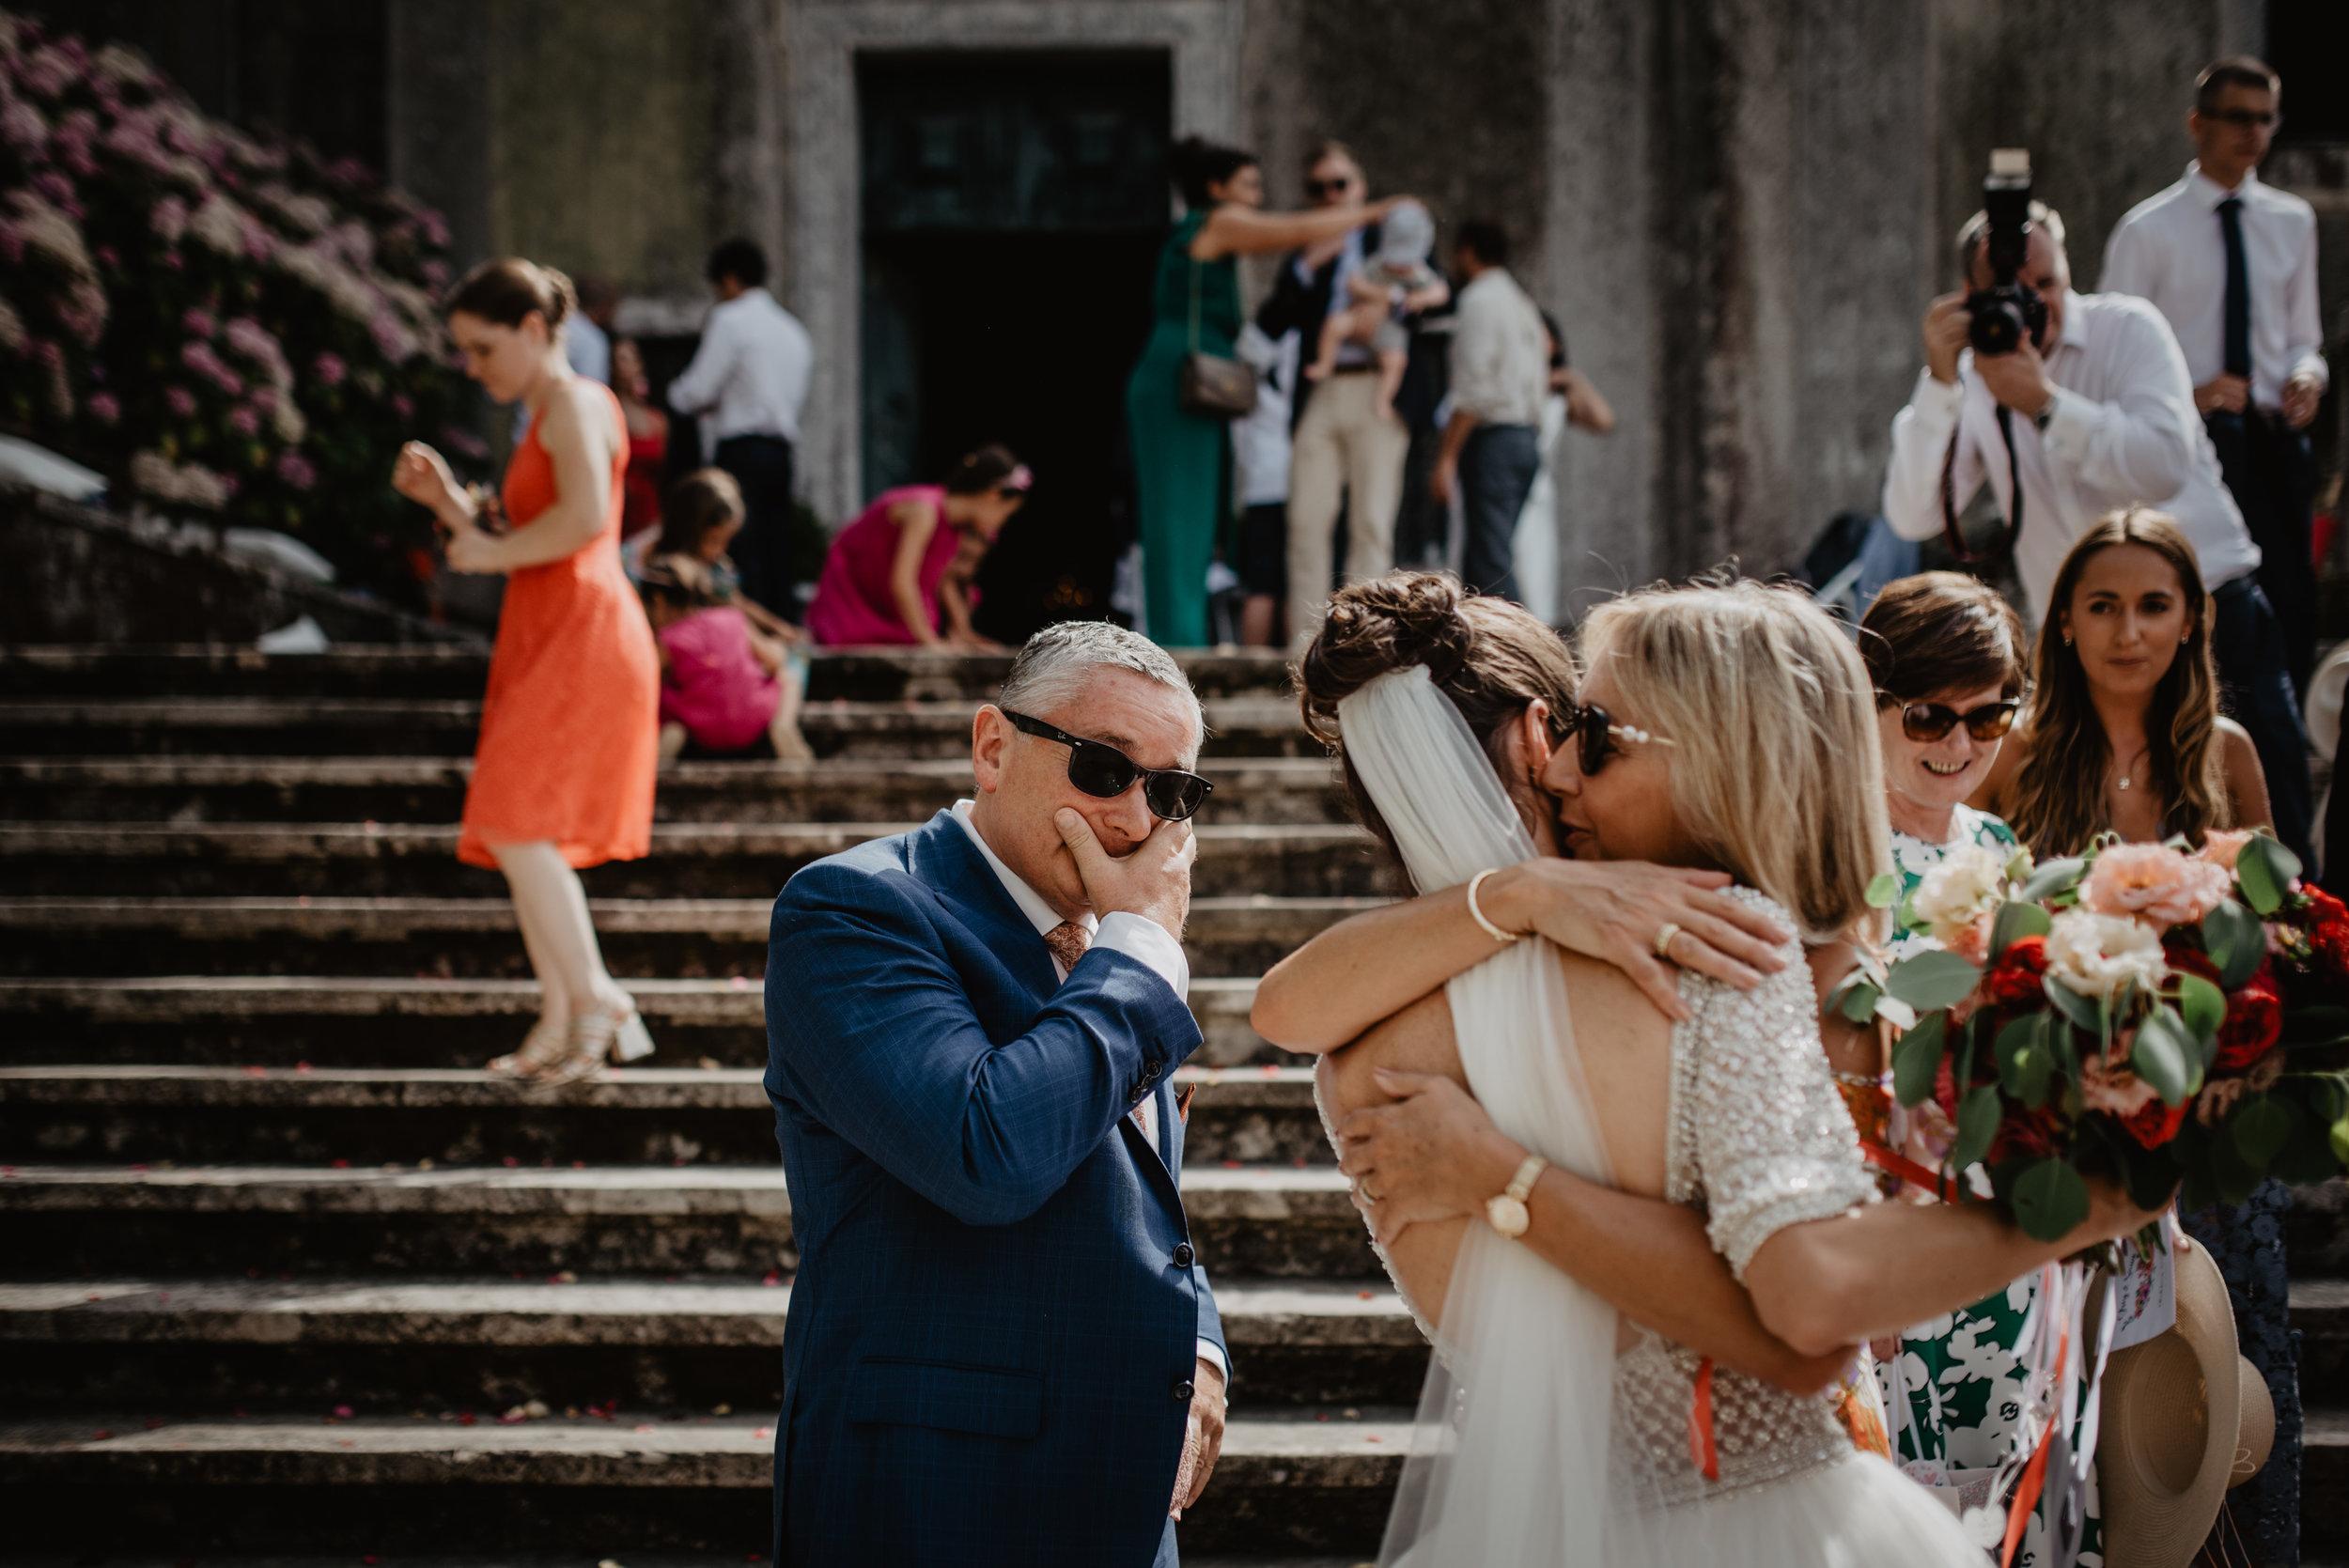 Lapela-photography-wedding-sintra-portugal-69.jpg